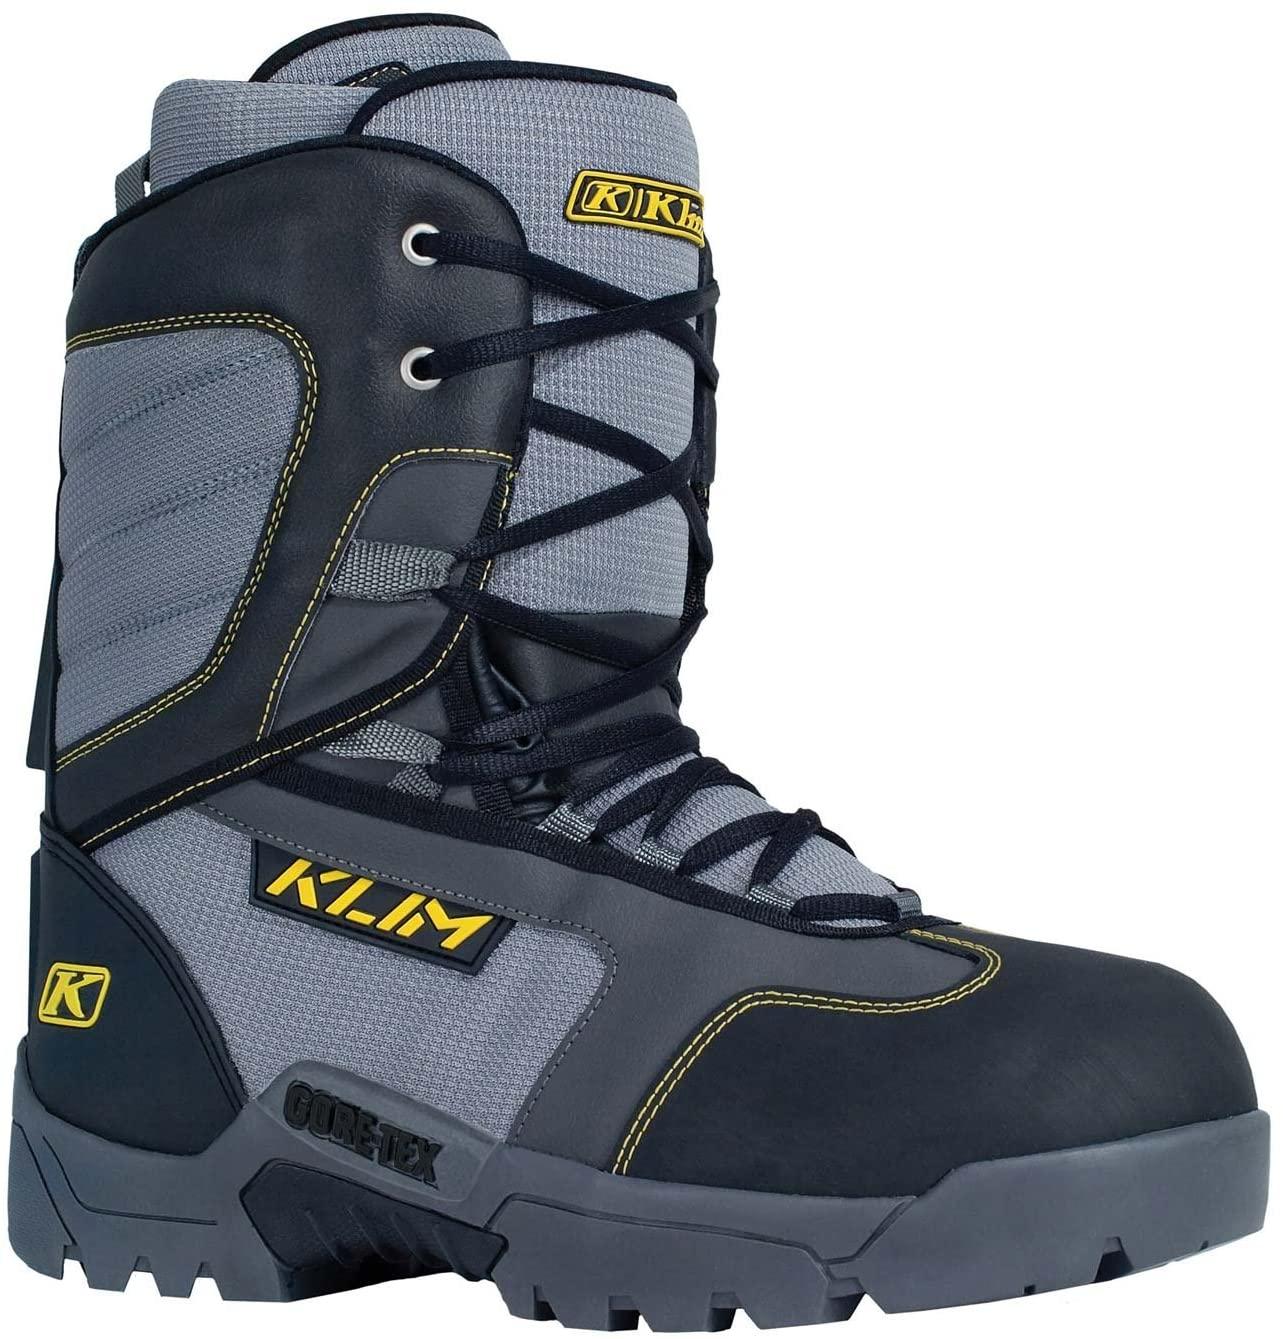 Klim Radium GTX Men's Snocross Snowmobile Boots - Black/Size 8